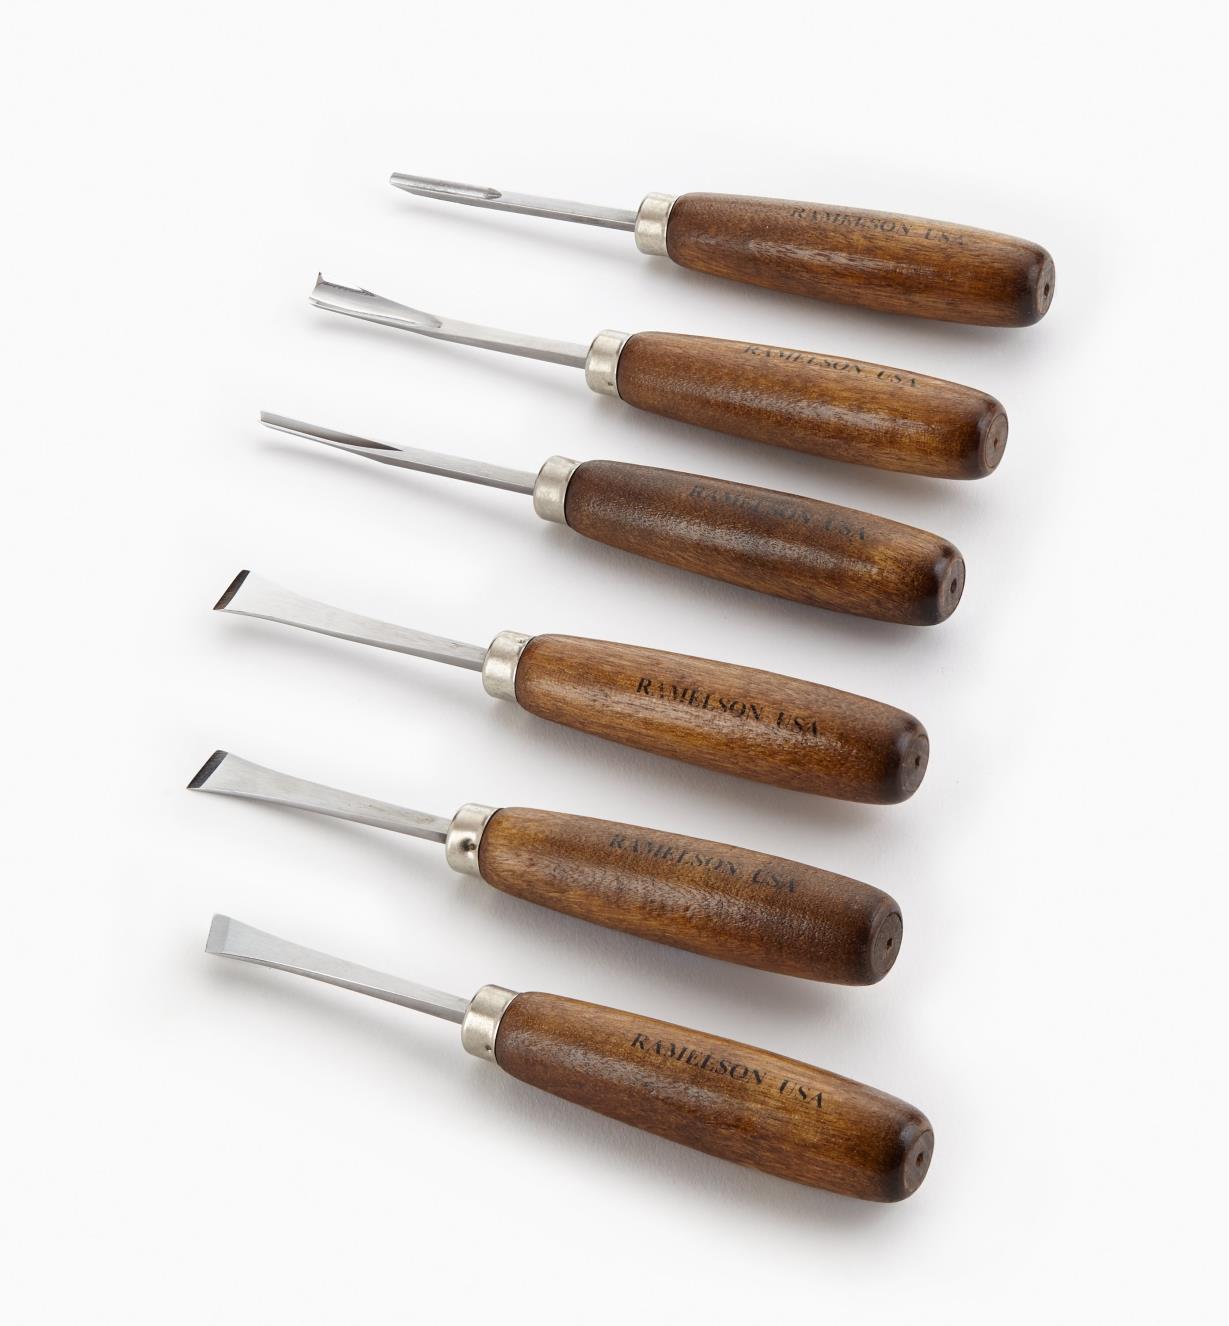 57D0501 - Basic Carving Set, Long Handle